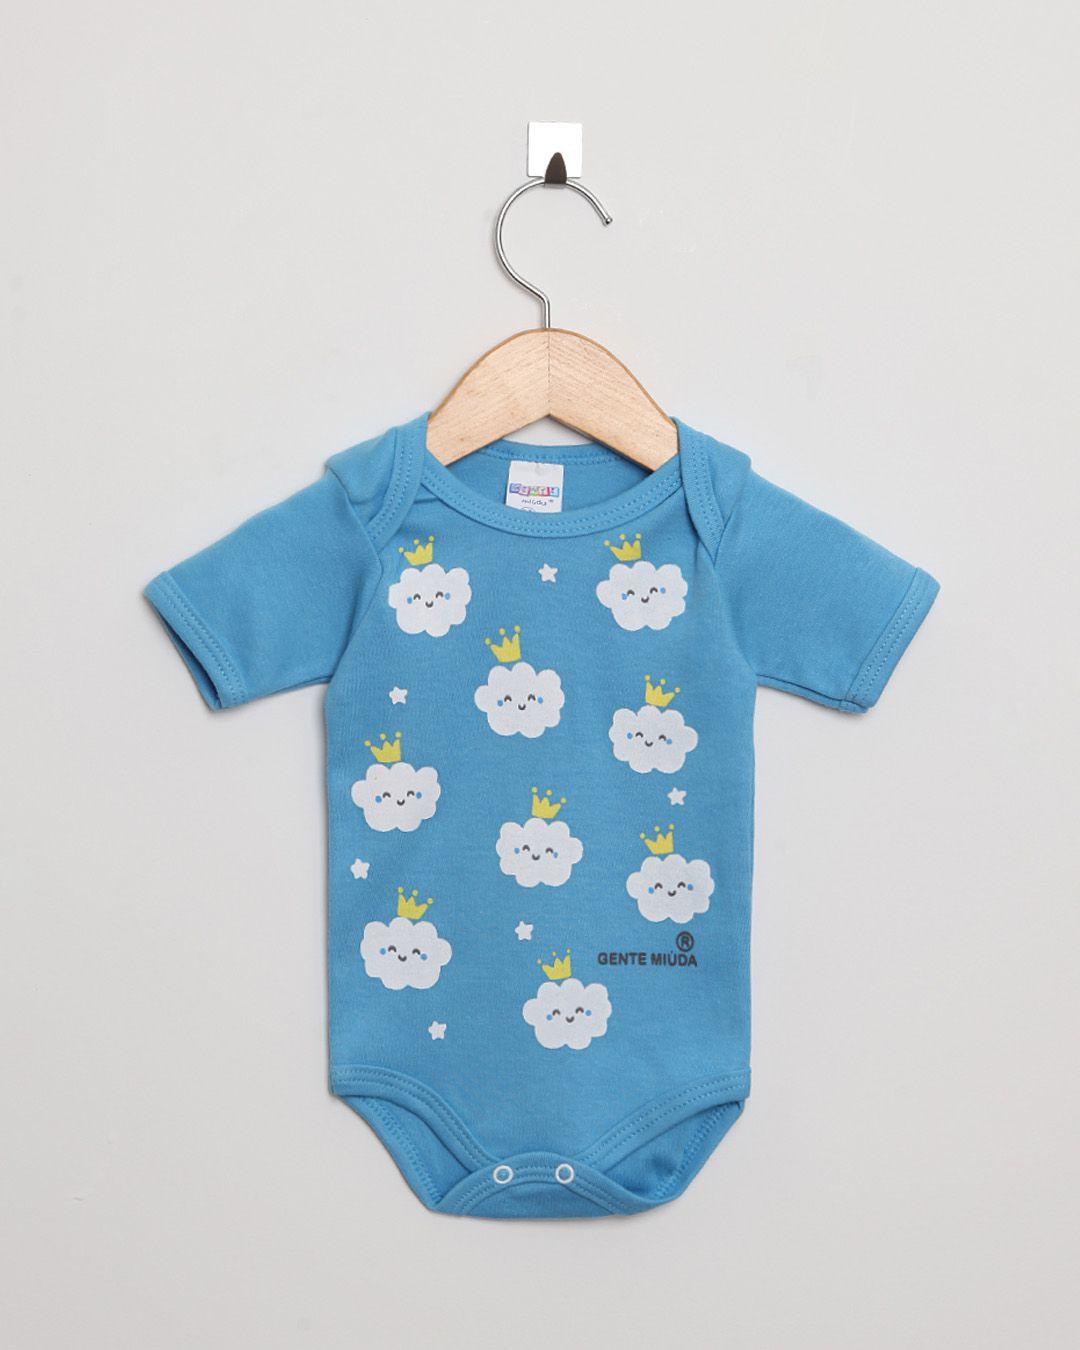 Body Bebê Manga Curta Suedine menina Azul Celeste Nuvens